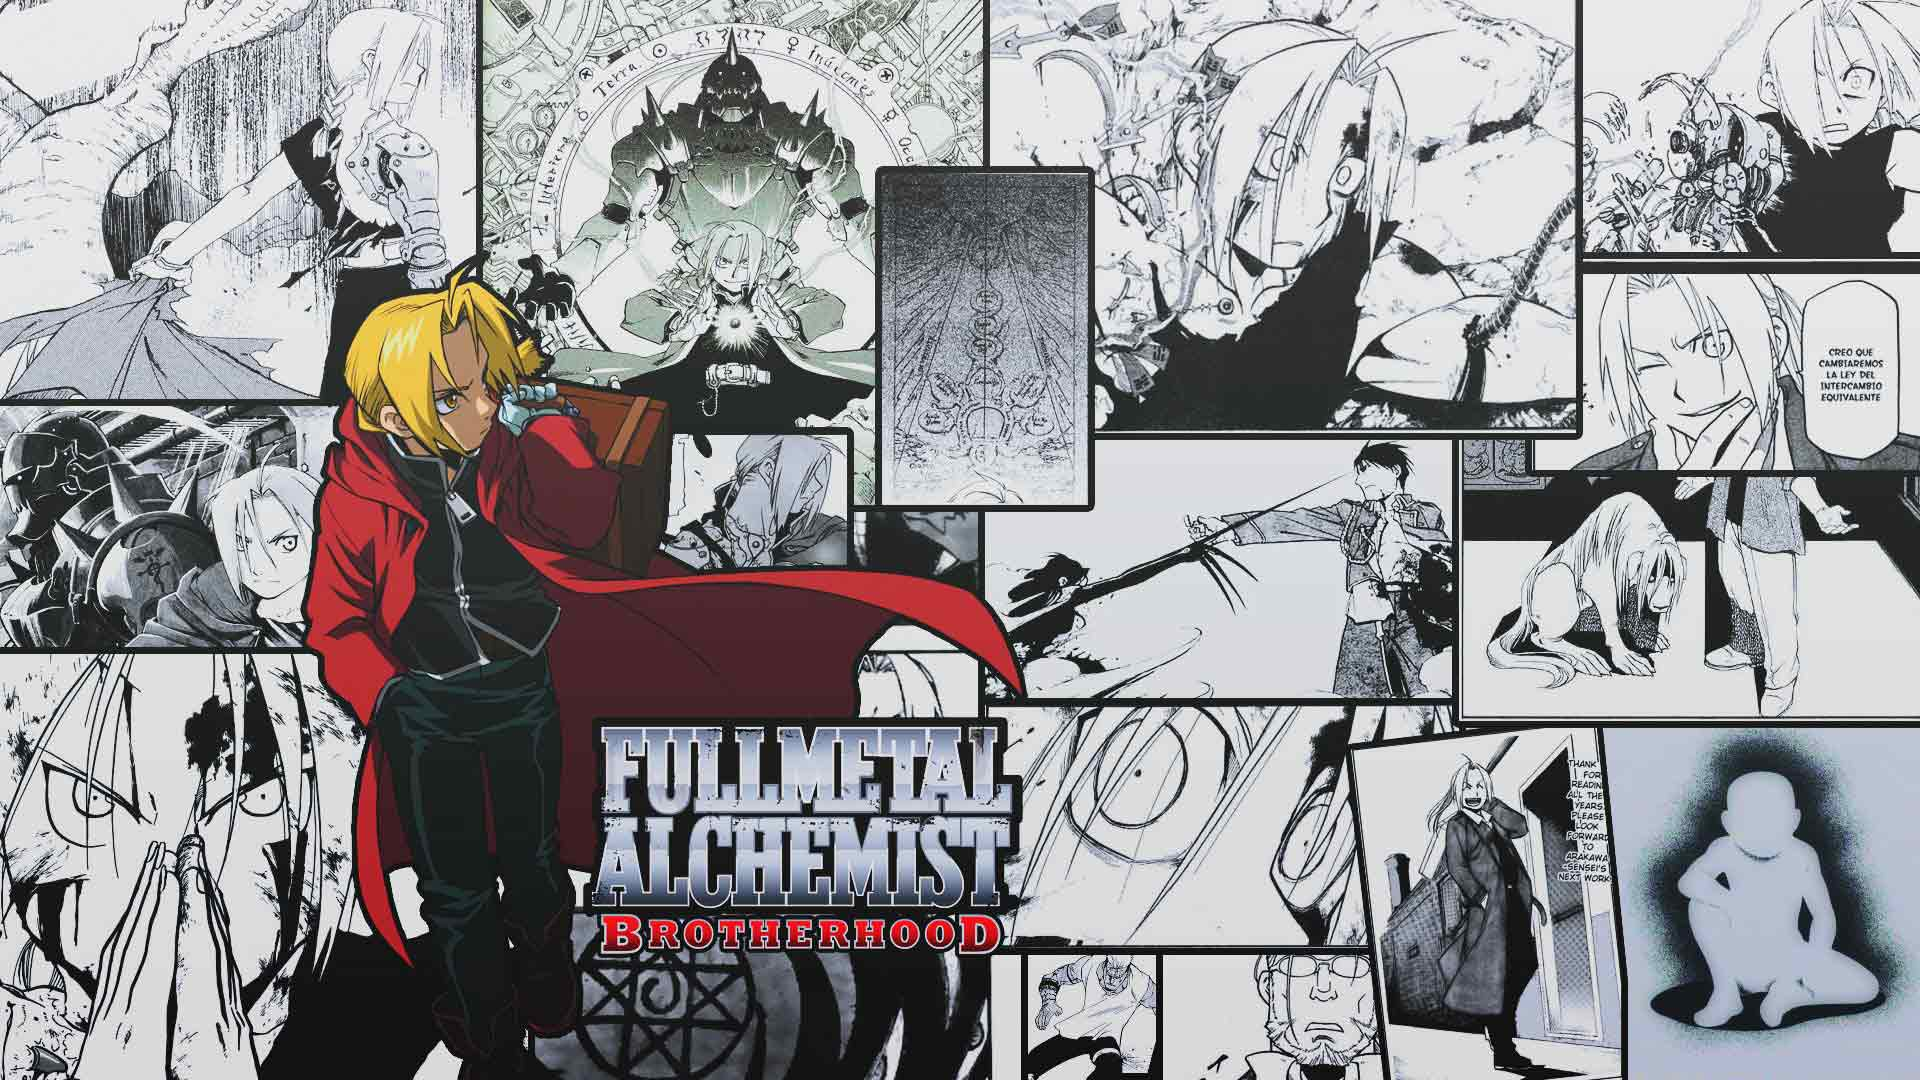 Fullmetal-Alchemist-ตัวละคร-ที่ทุกคนชื่นชอบ1